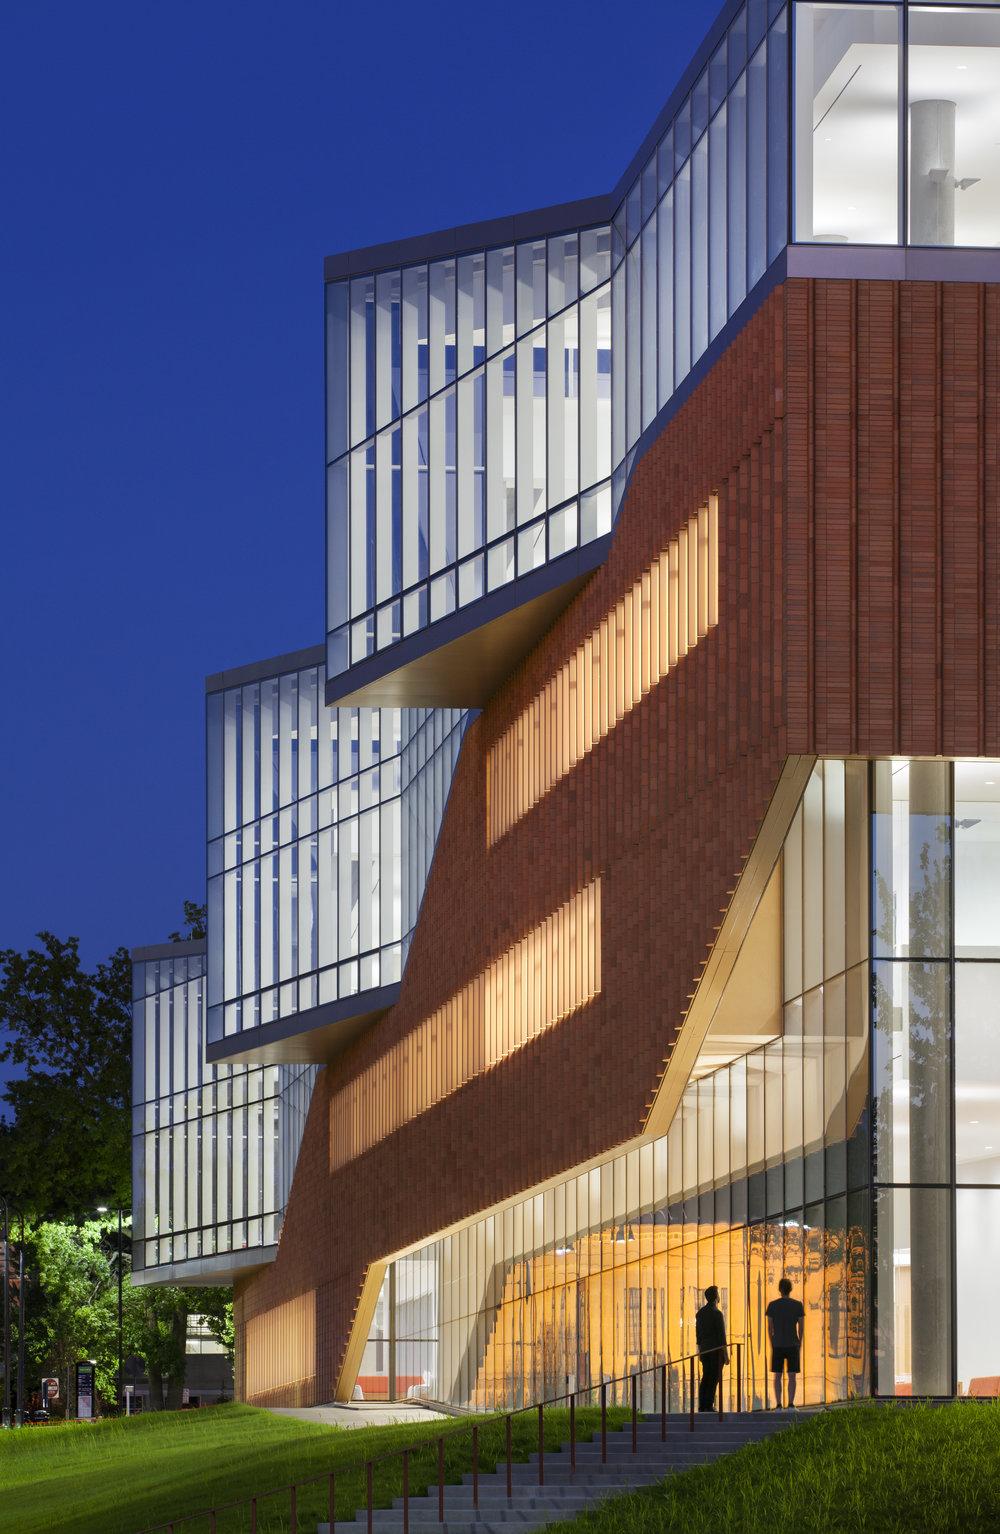 Architect: Weiss Manfredi  Photography: Albert Vecerka /Esto